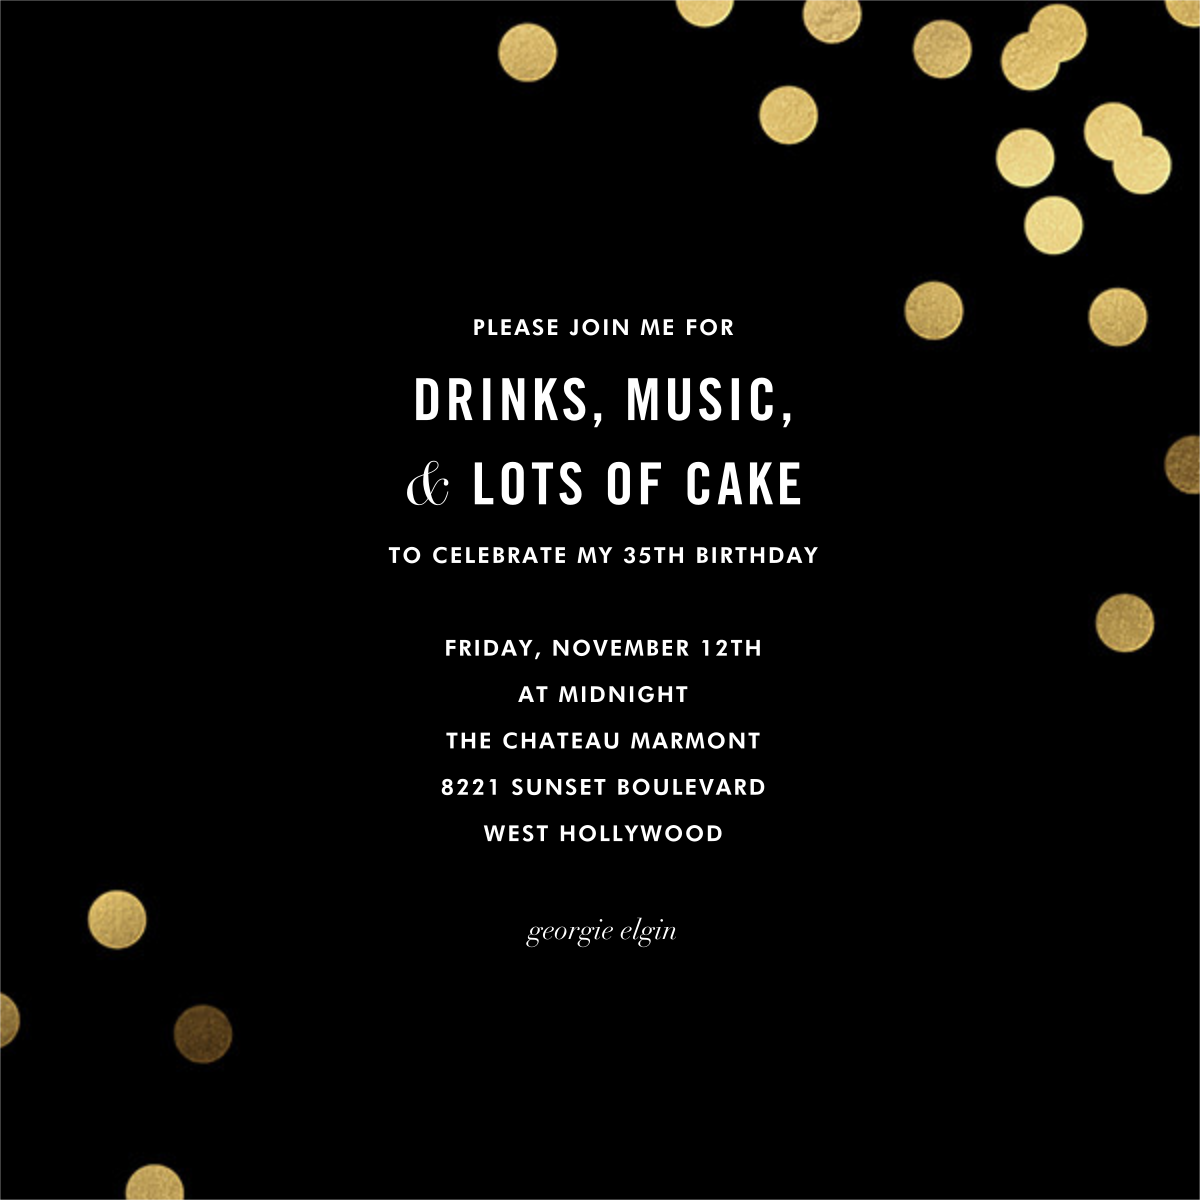 Confetti (Square) - Black - kate spade new york - Adult birthday invitations